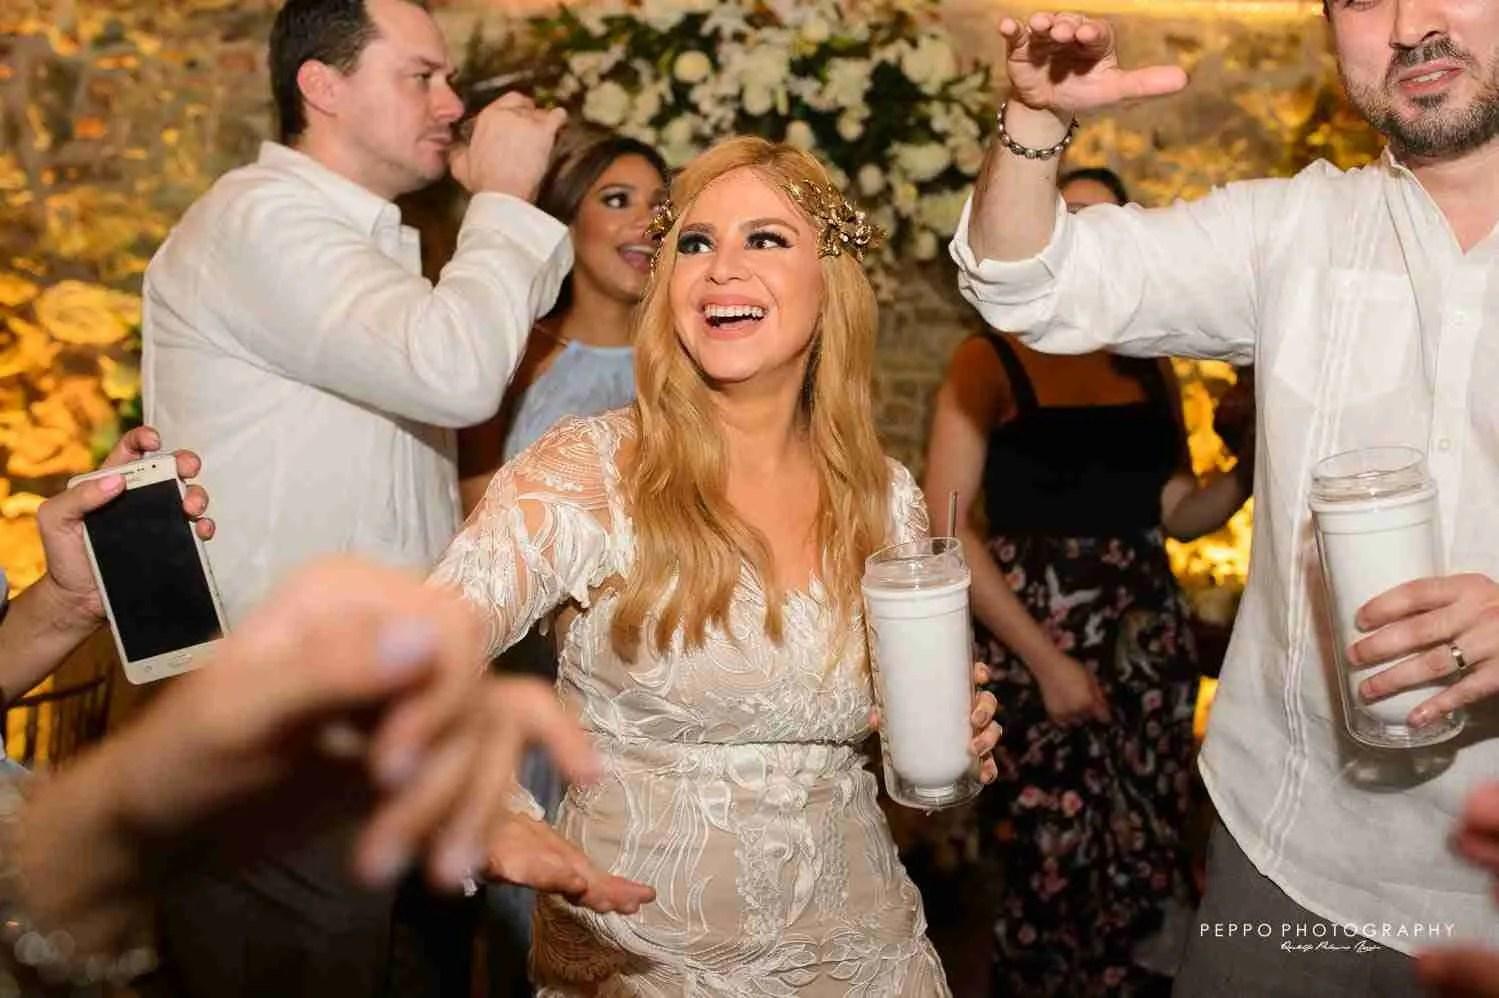 Johanna just a happy bride